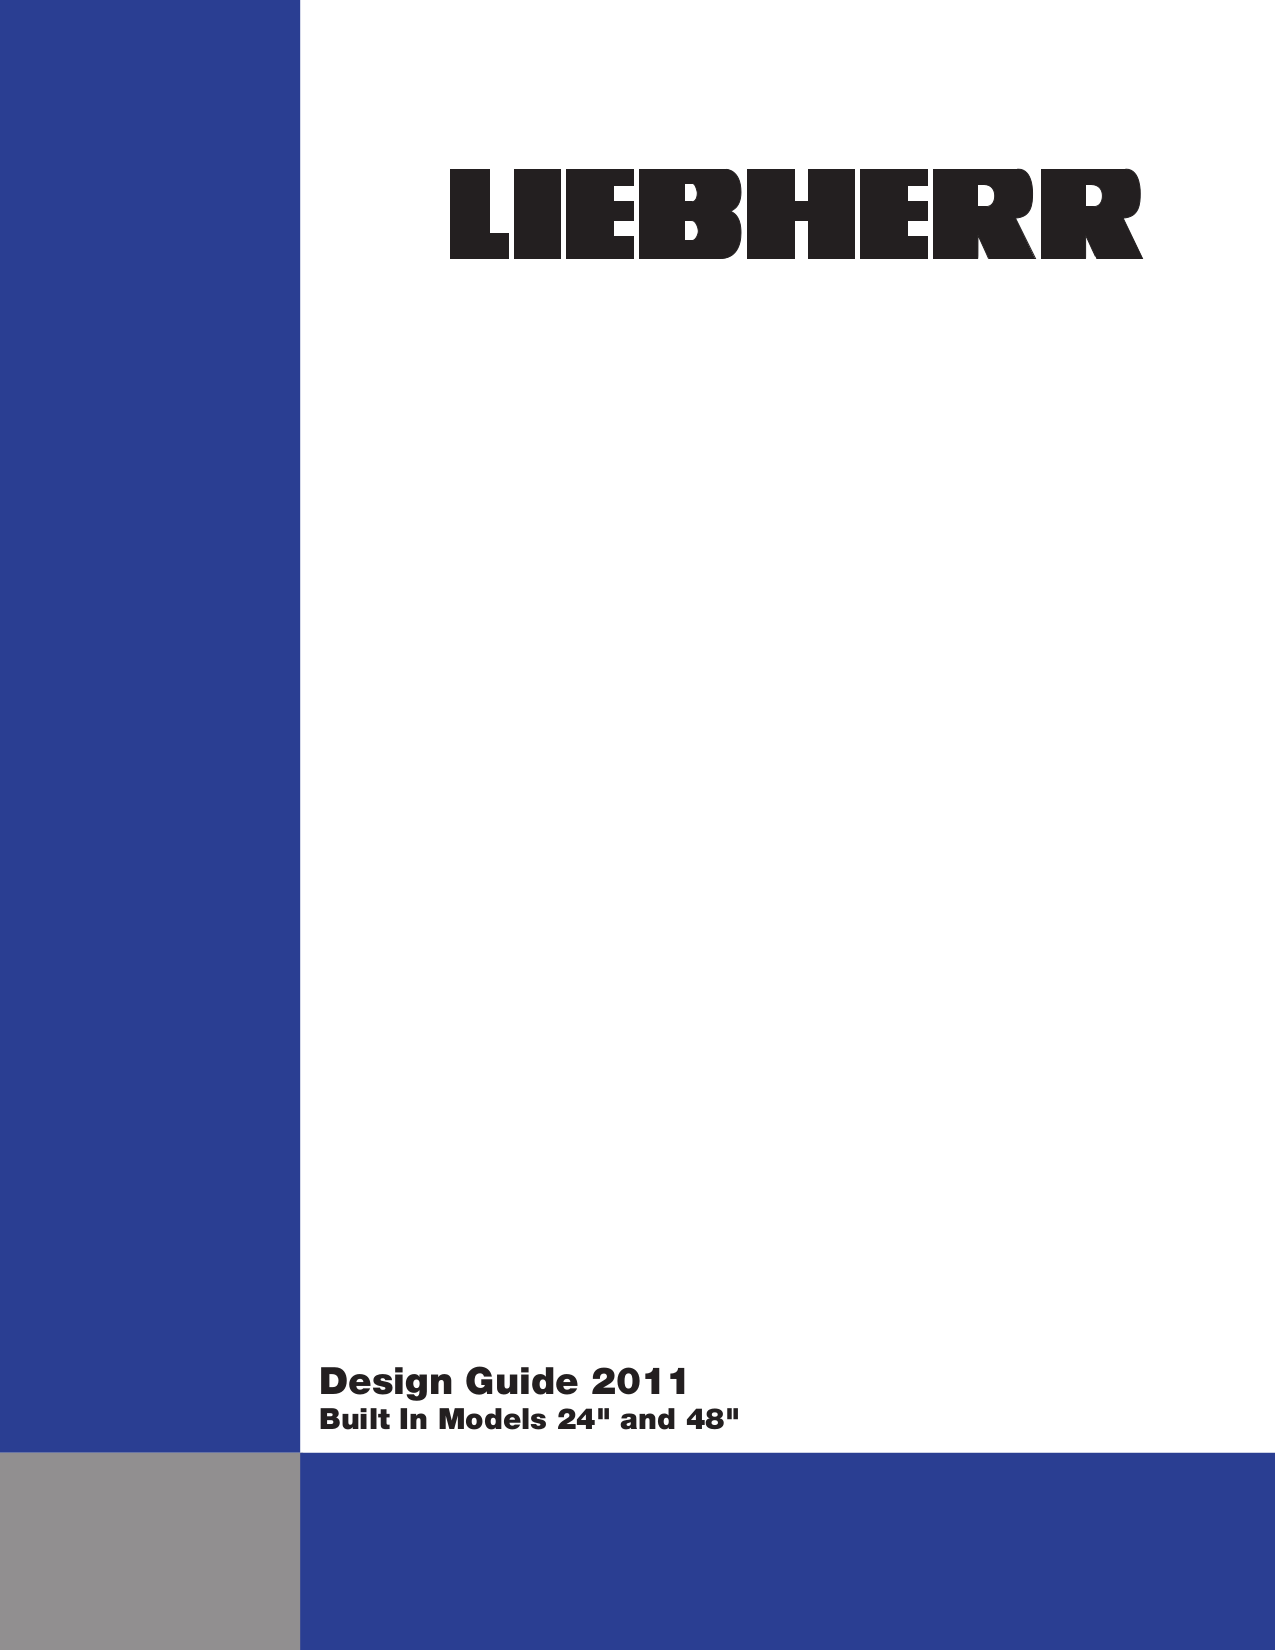 pdf for Liebherr Freezer FI1051 manual